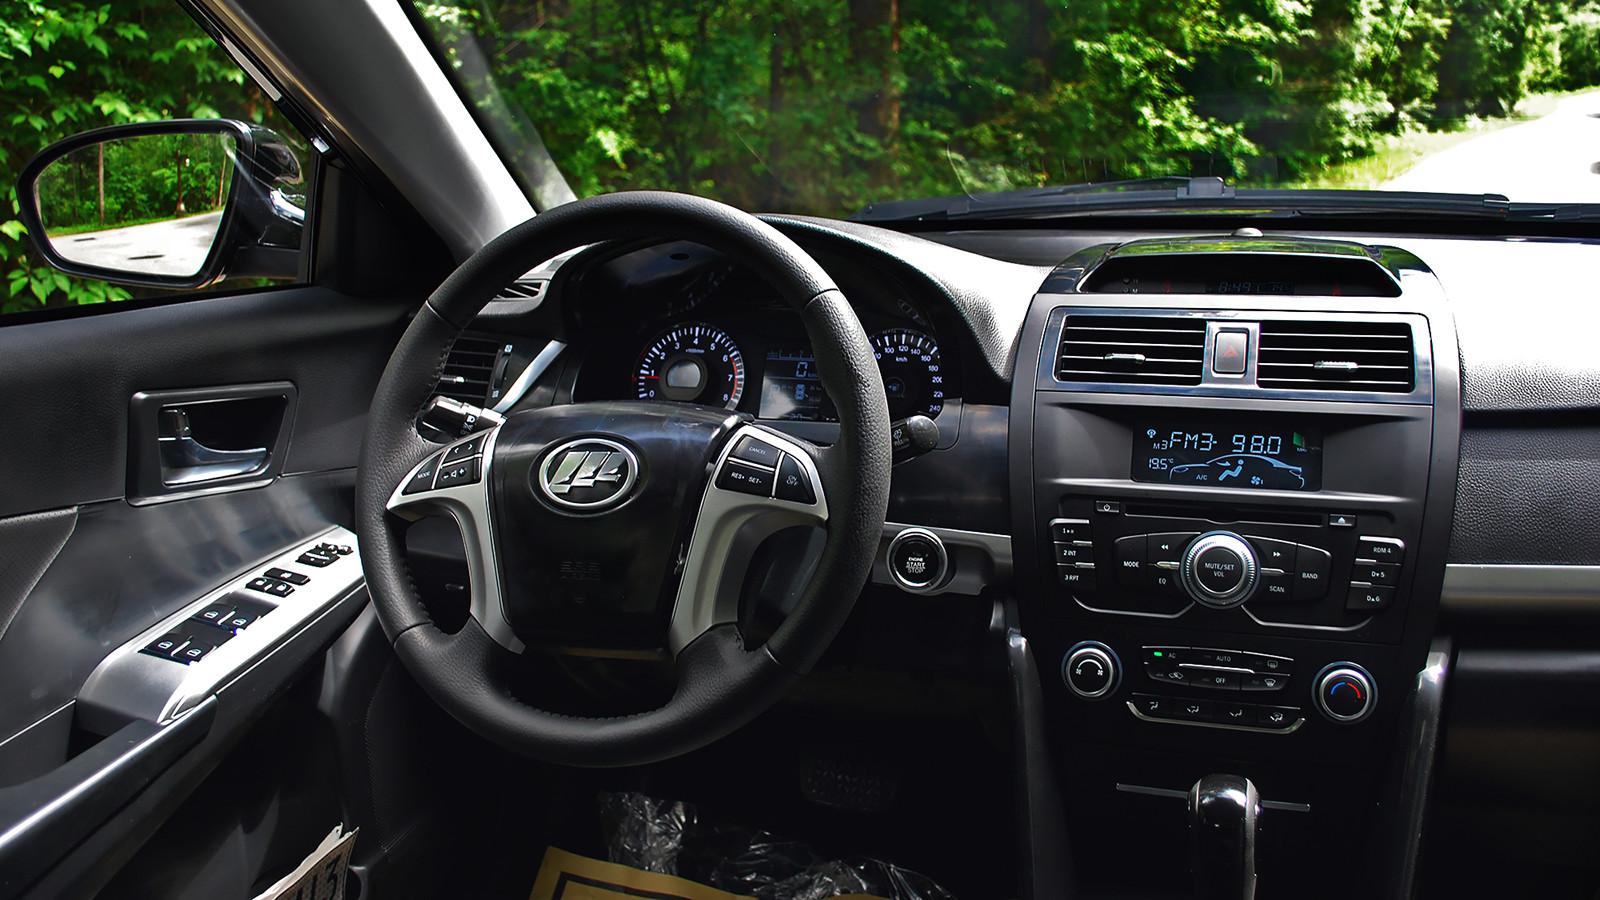 Объявлена дата начала реализации на русском рынке седана Лифан 820